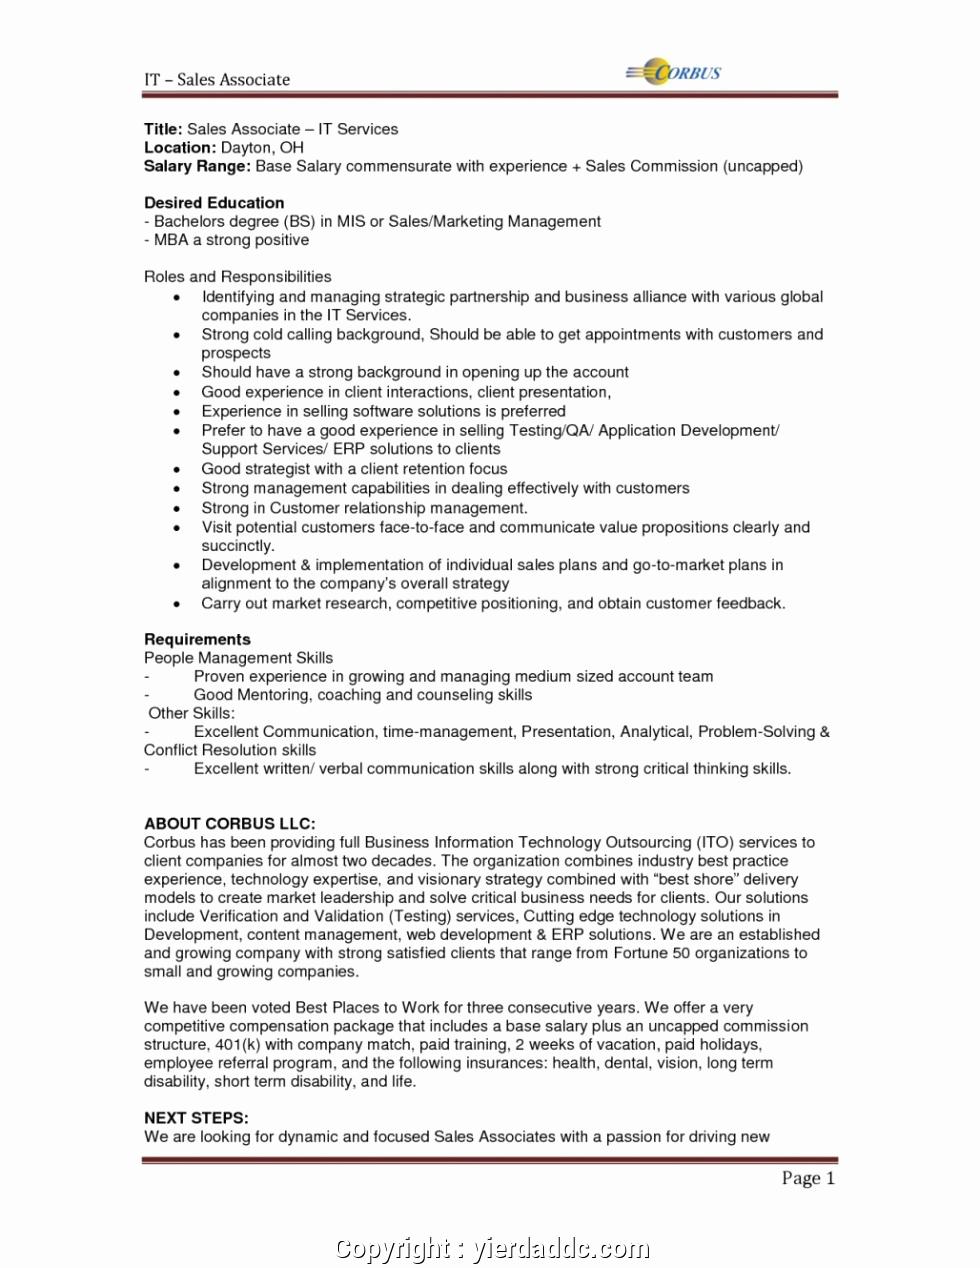 Sales and Marketing Job Description Beautiful Professional Sales and Marketing Job Description for